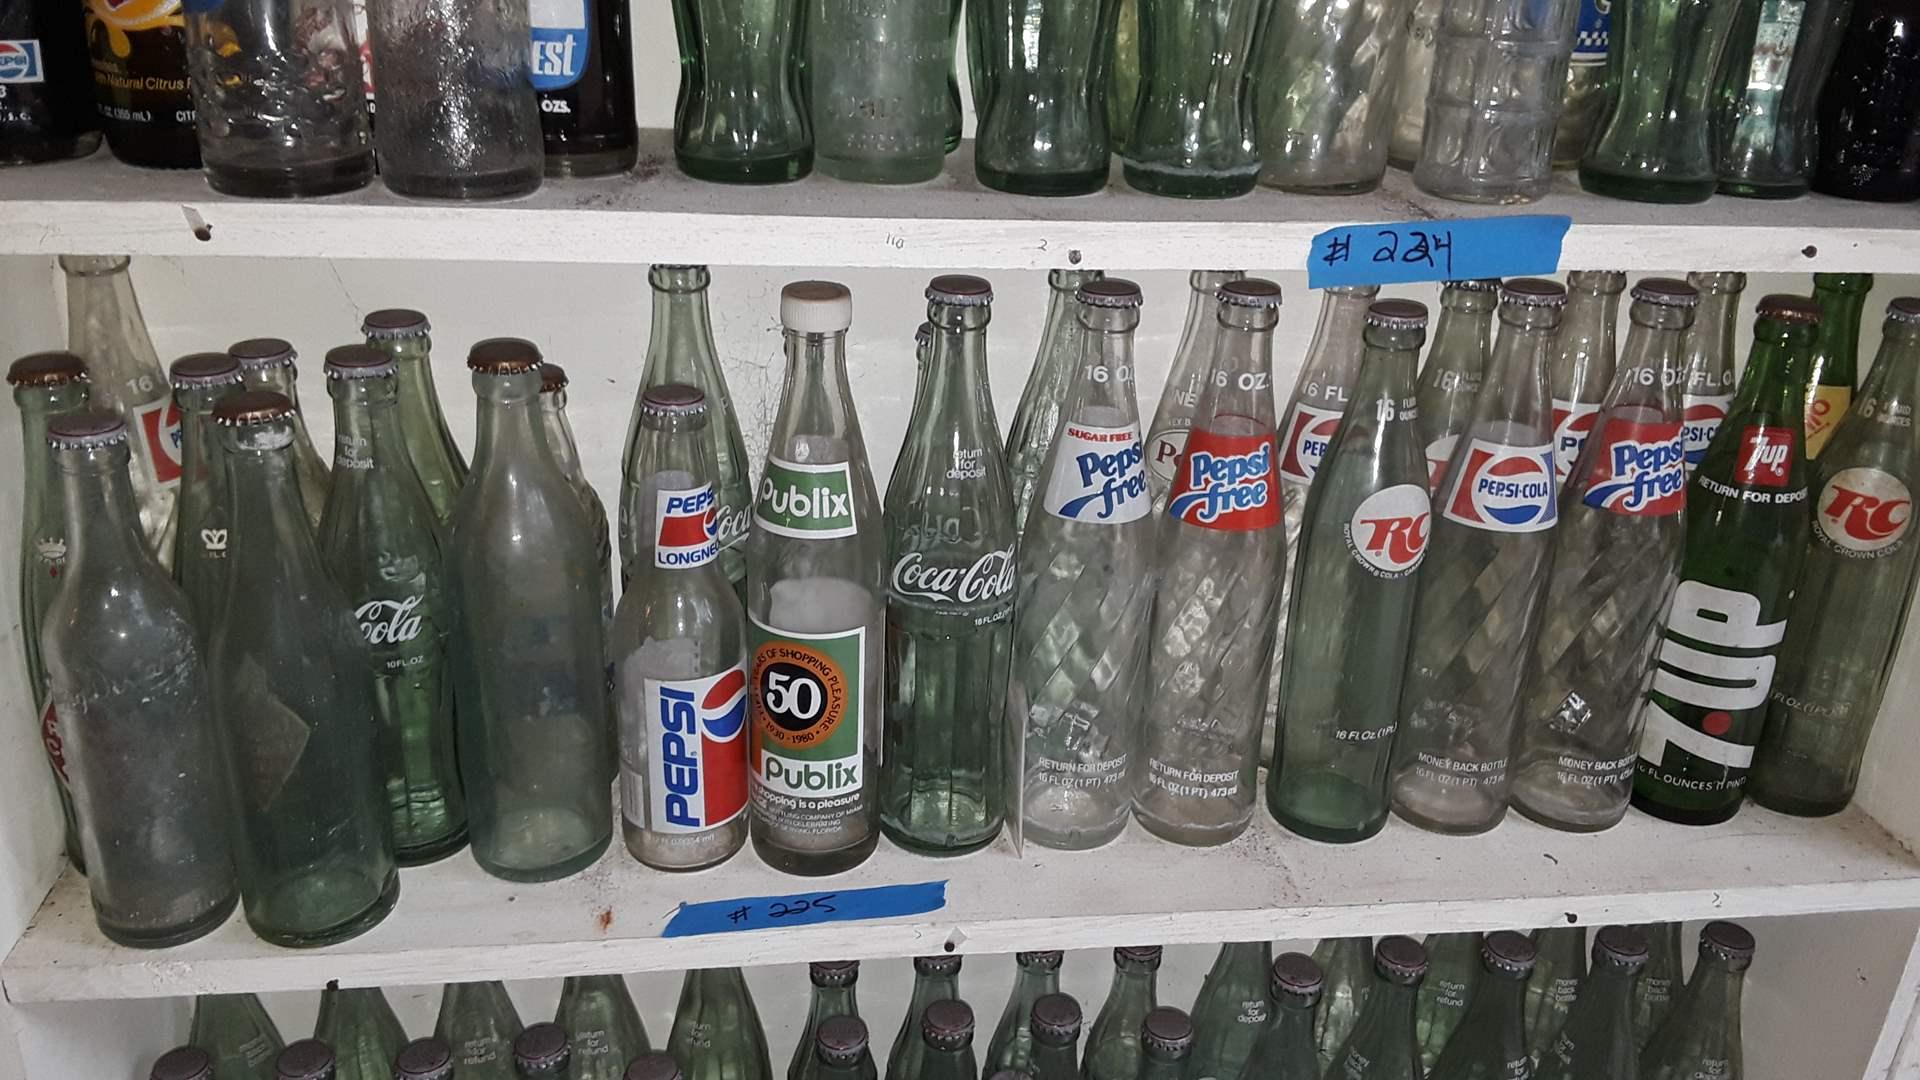 Lot # 225 COLLECTIBLE SODA BOTTLES, PEPSI, PEPSI FREE, PUBLIX